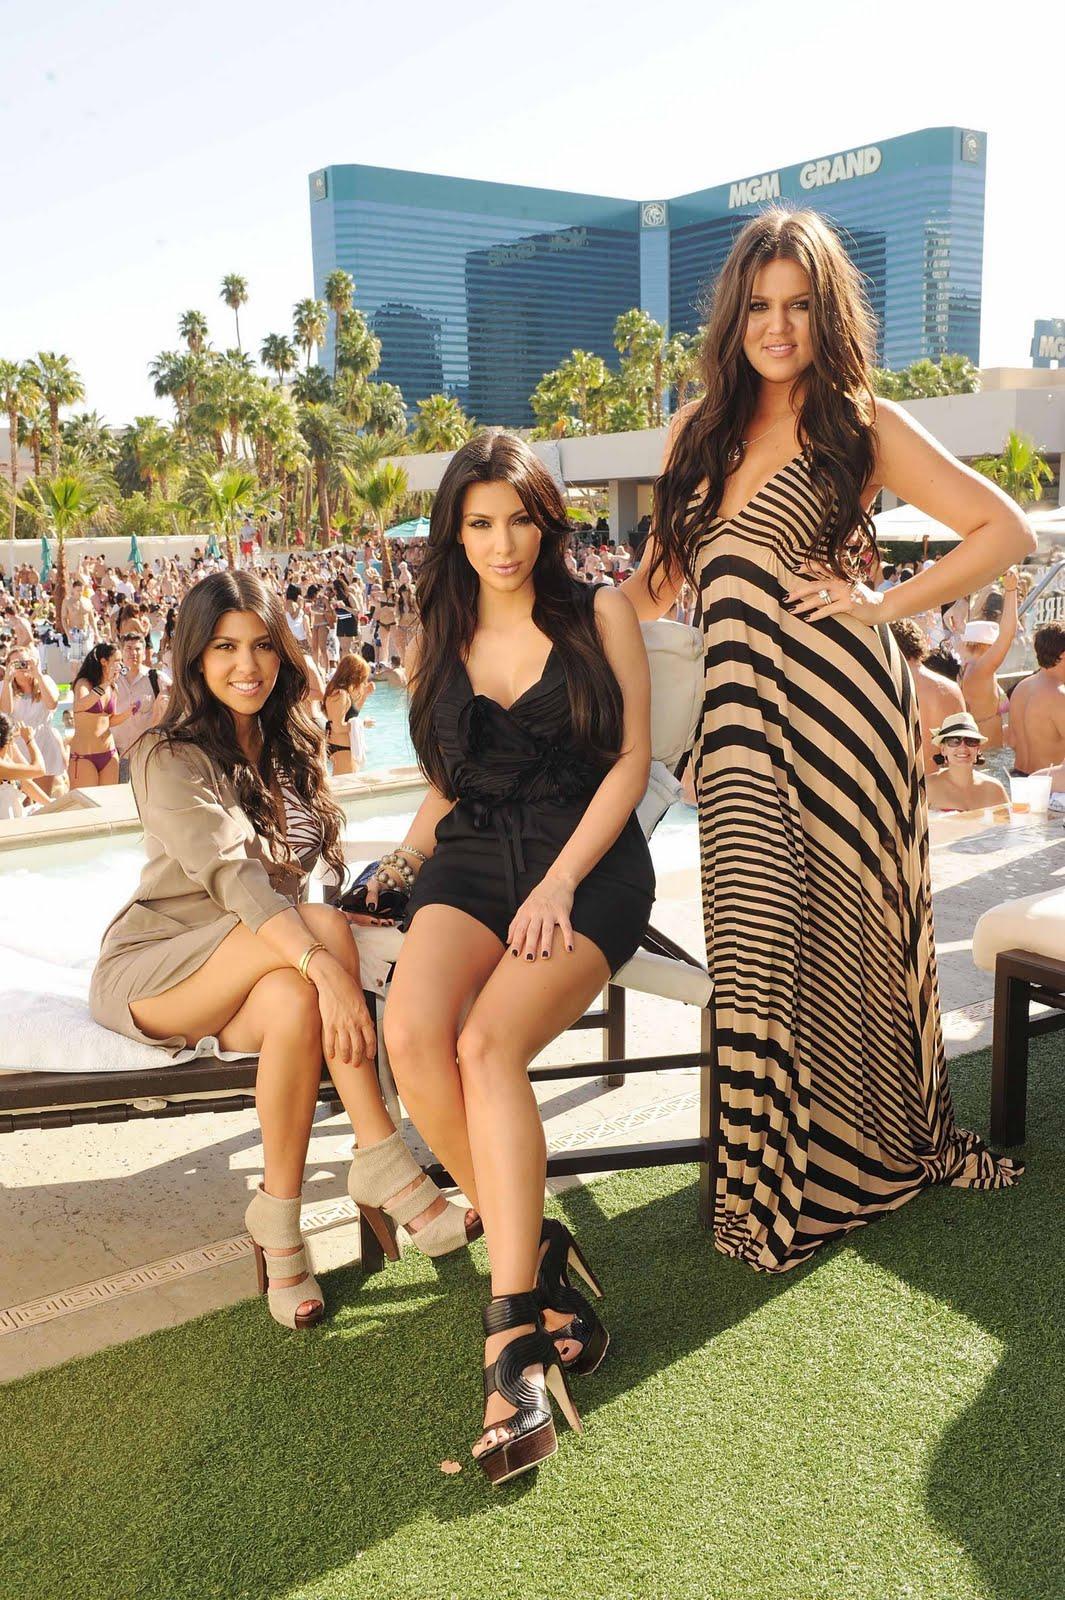 http://1.bp.blogspot.com/_4KxmFp2OOHI/S9TiuIZ6PfI/AAAAAAAAJxY/ghH4-QNb1BM/s1600/Kourtney+Kim+and+Khloe+Kardashian+at+WET+REPUBLIC,+Las+Vegas+2.jpg